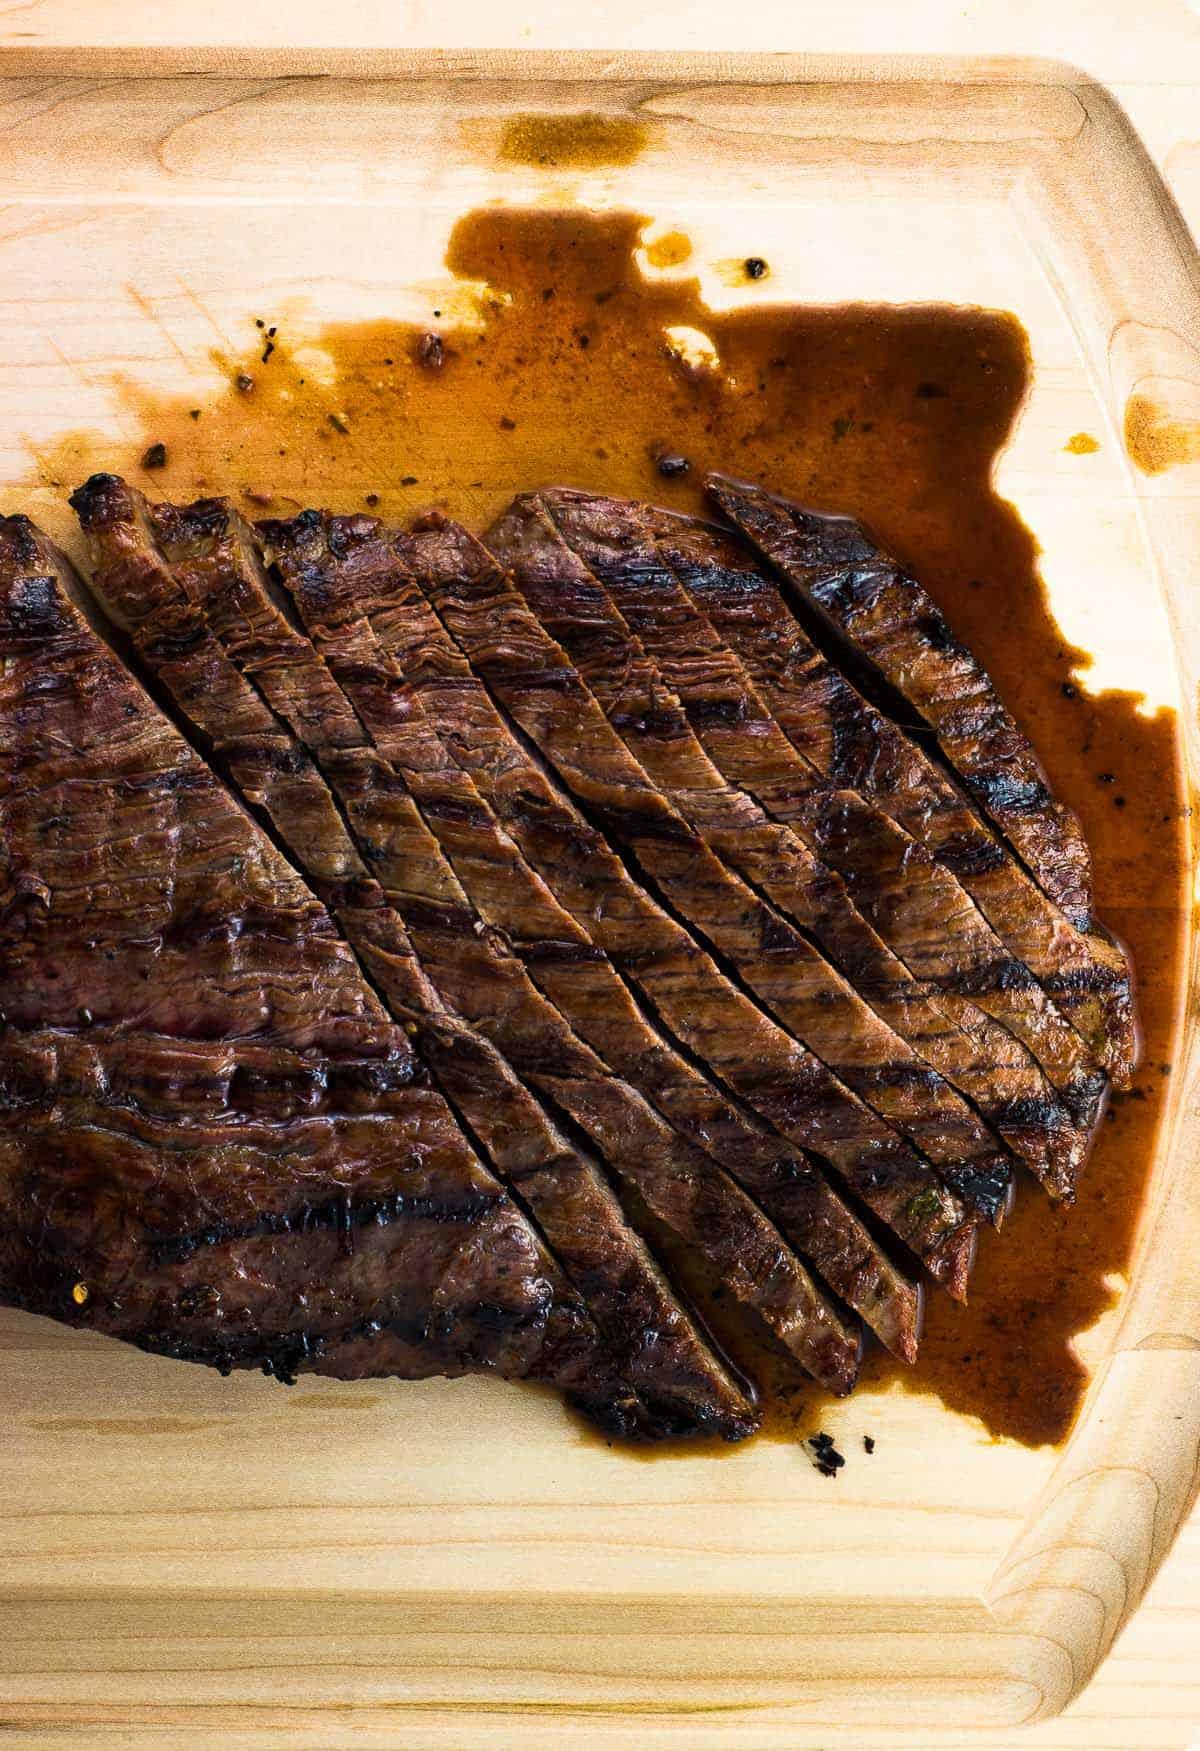 Half sliced steak on a wooden cutting board.